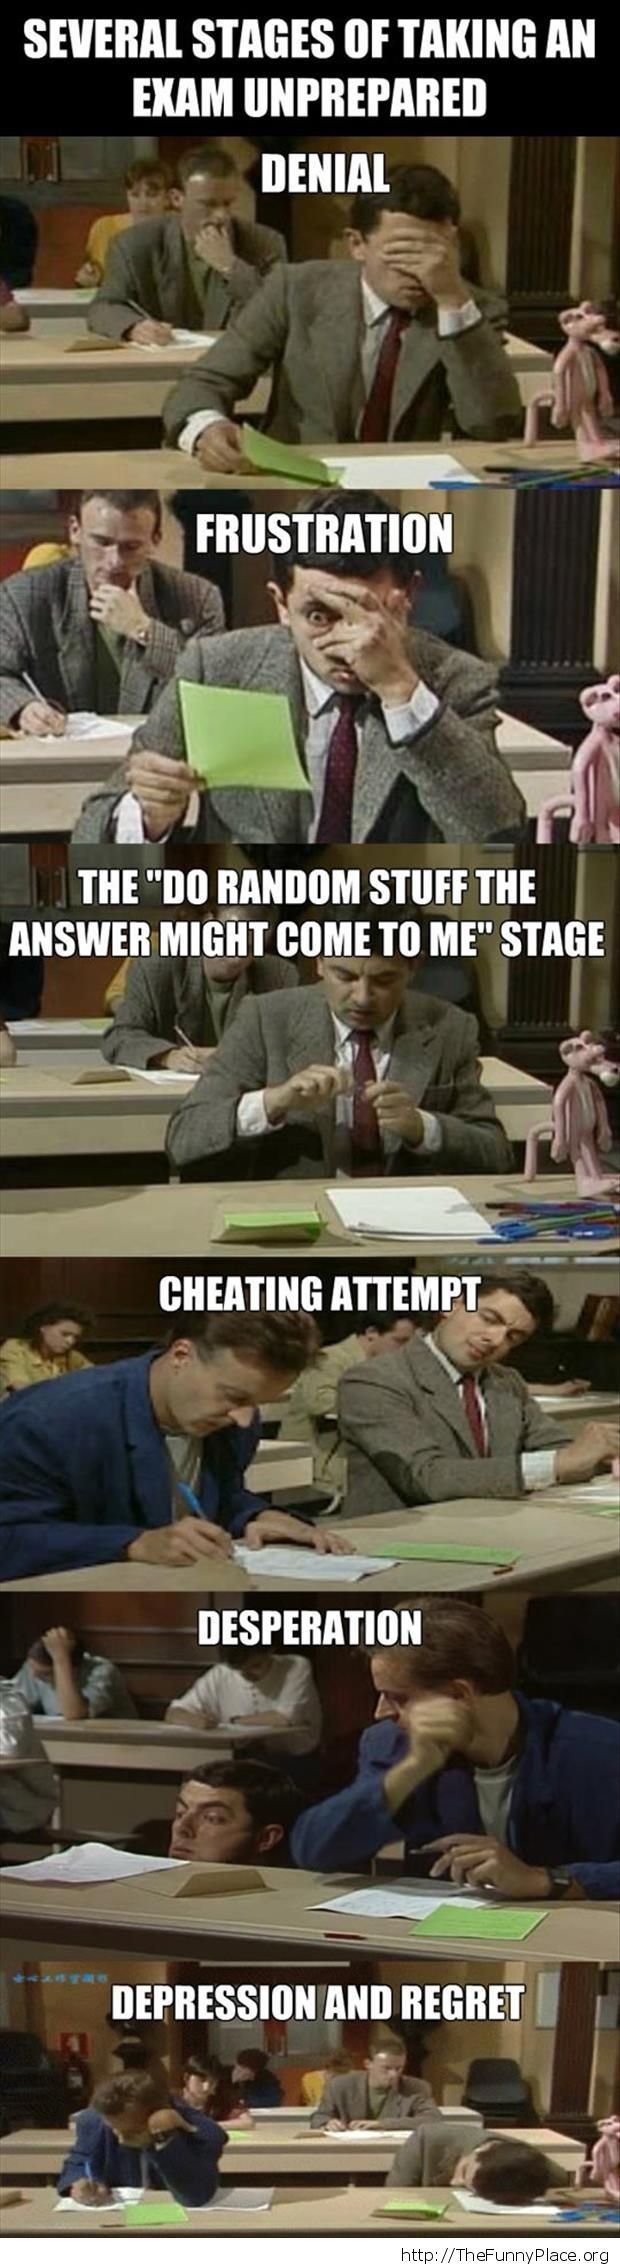 Taking an exam unprepared